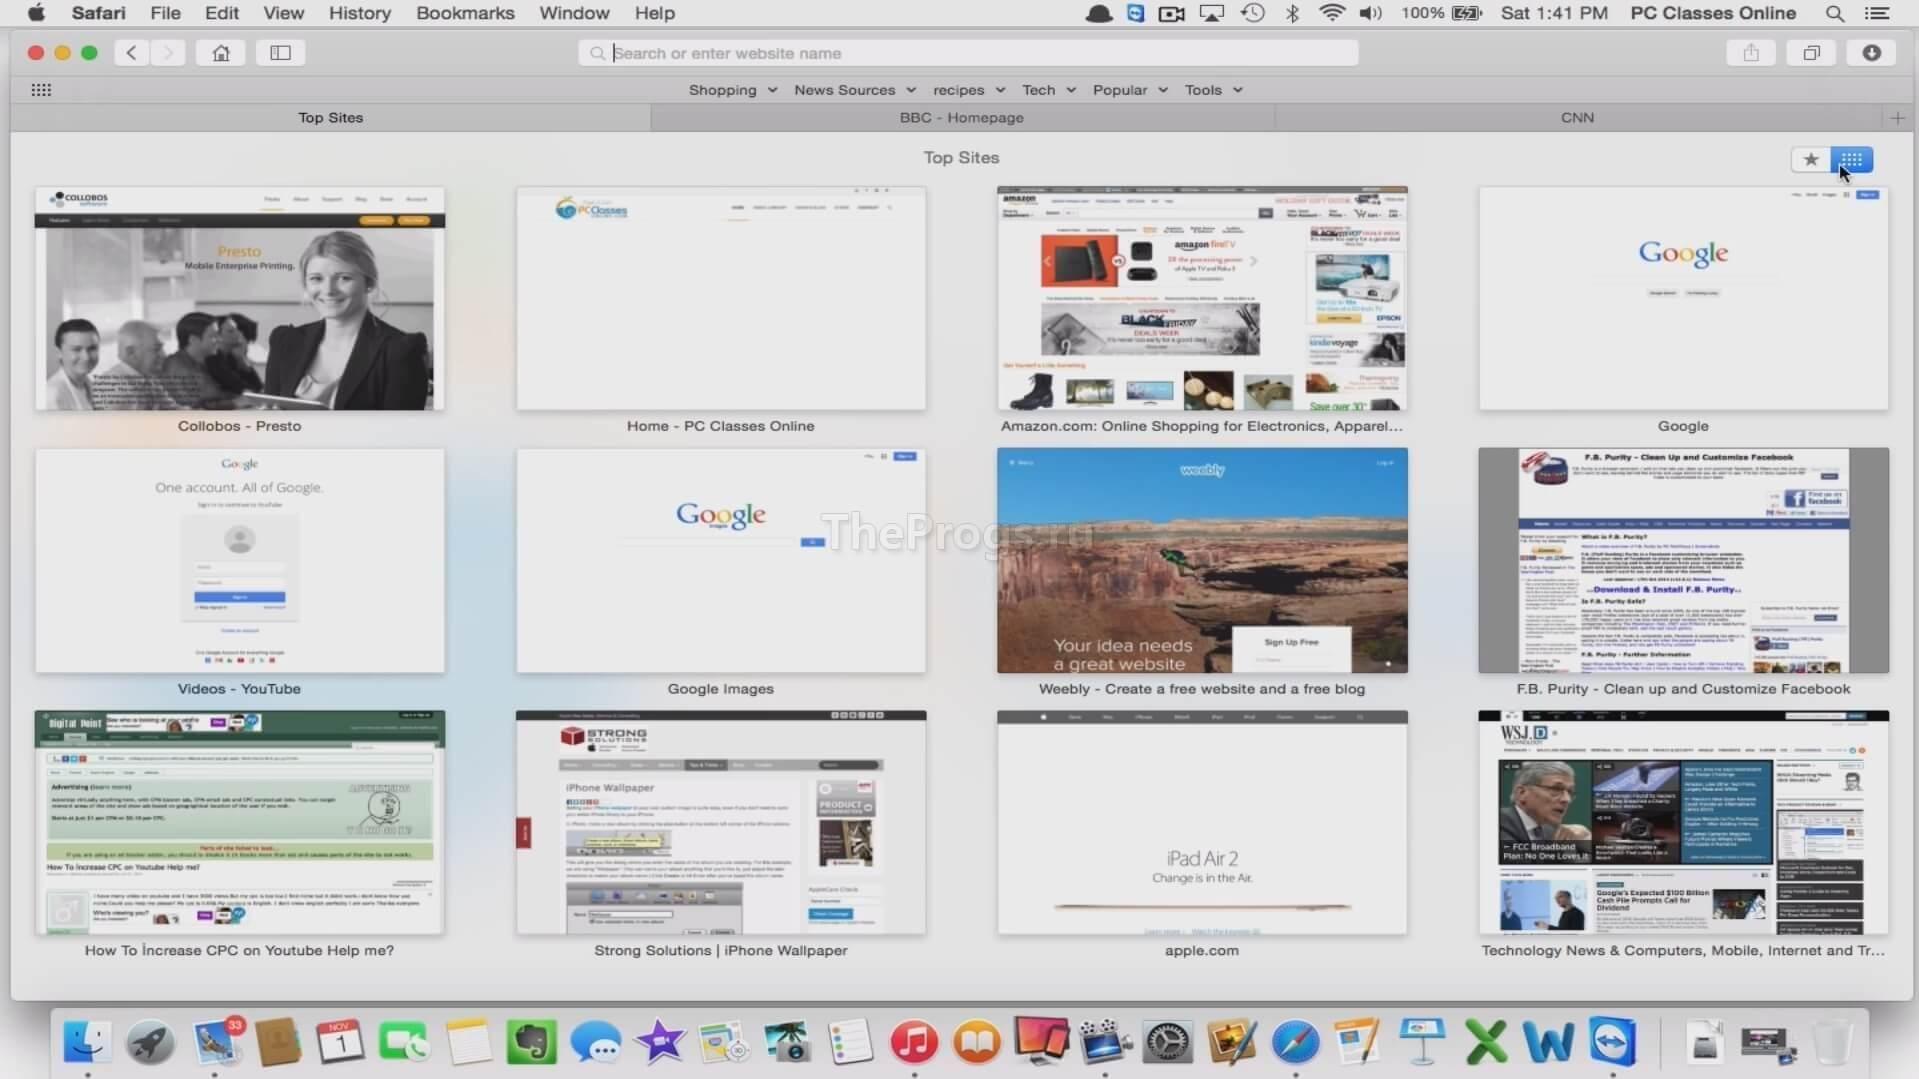 Safari скриншот (фото)